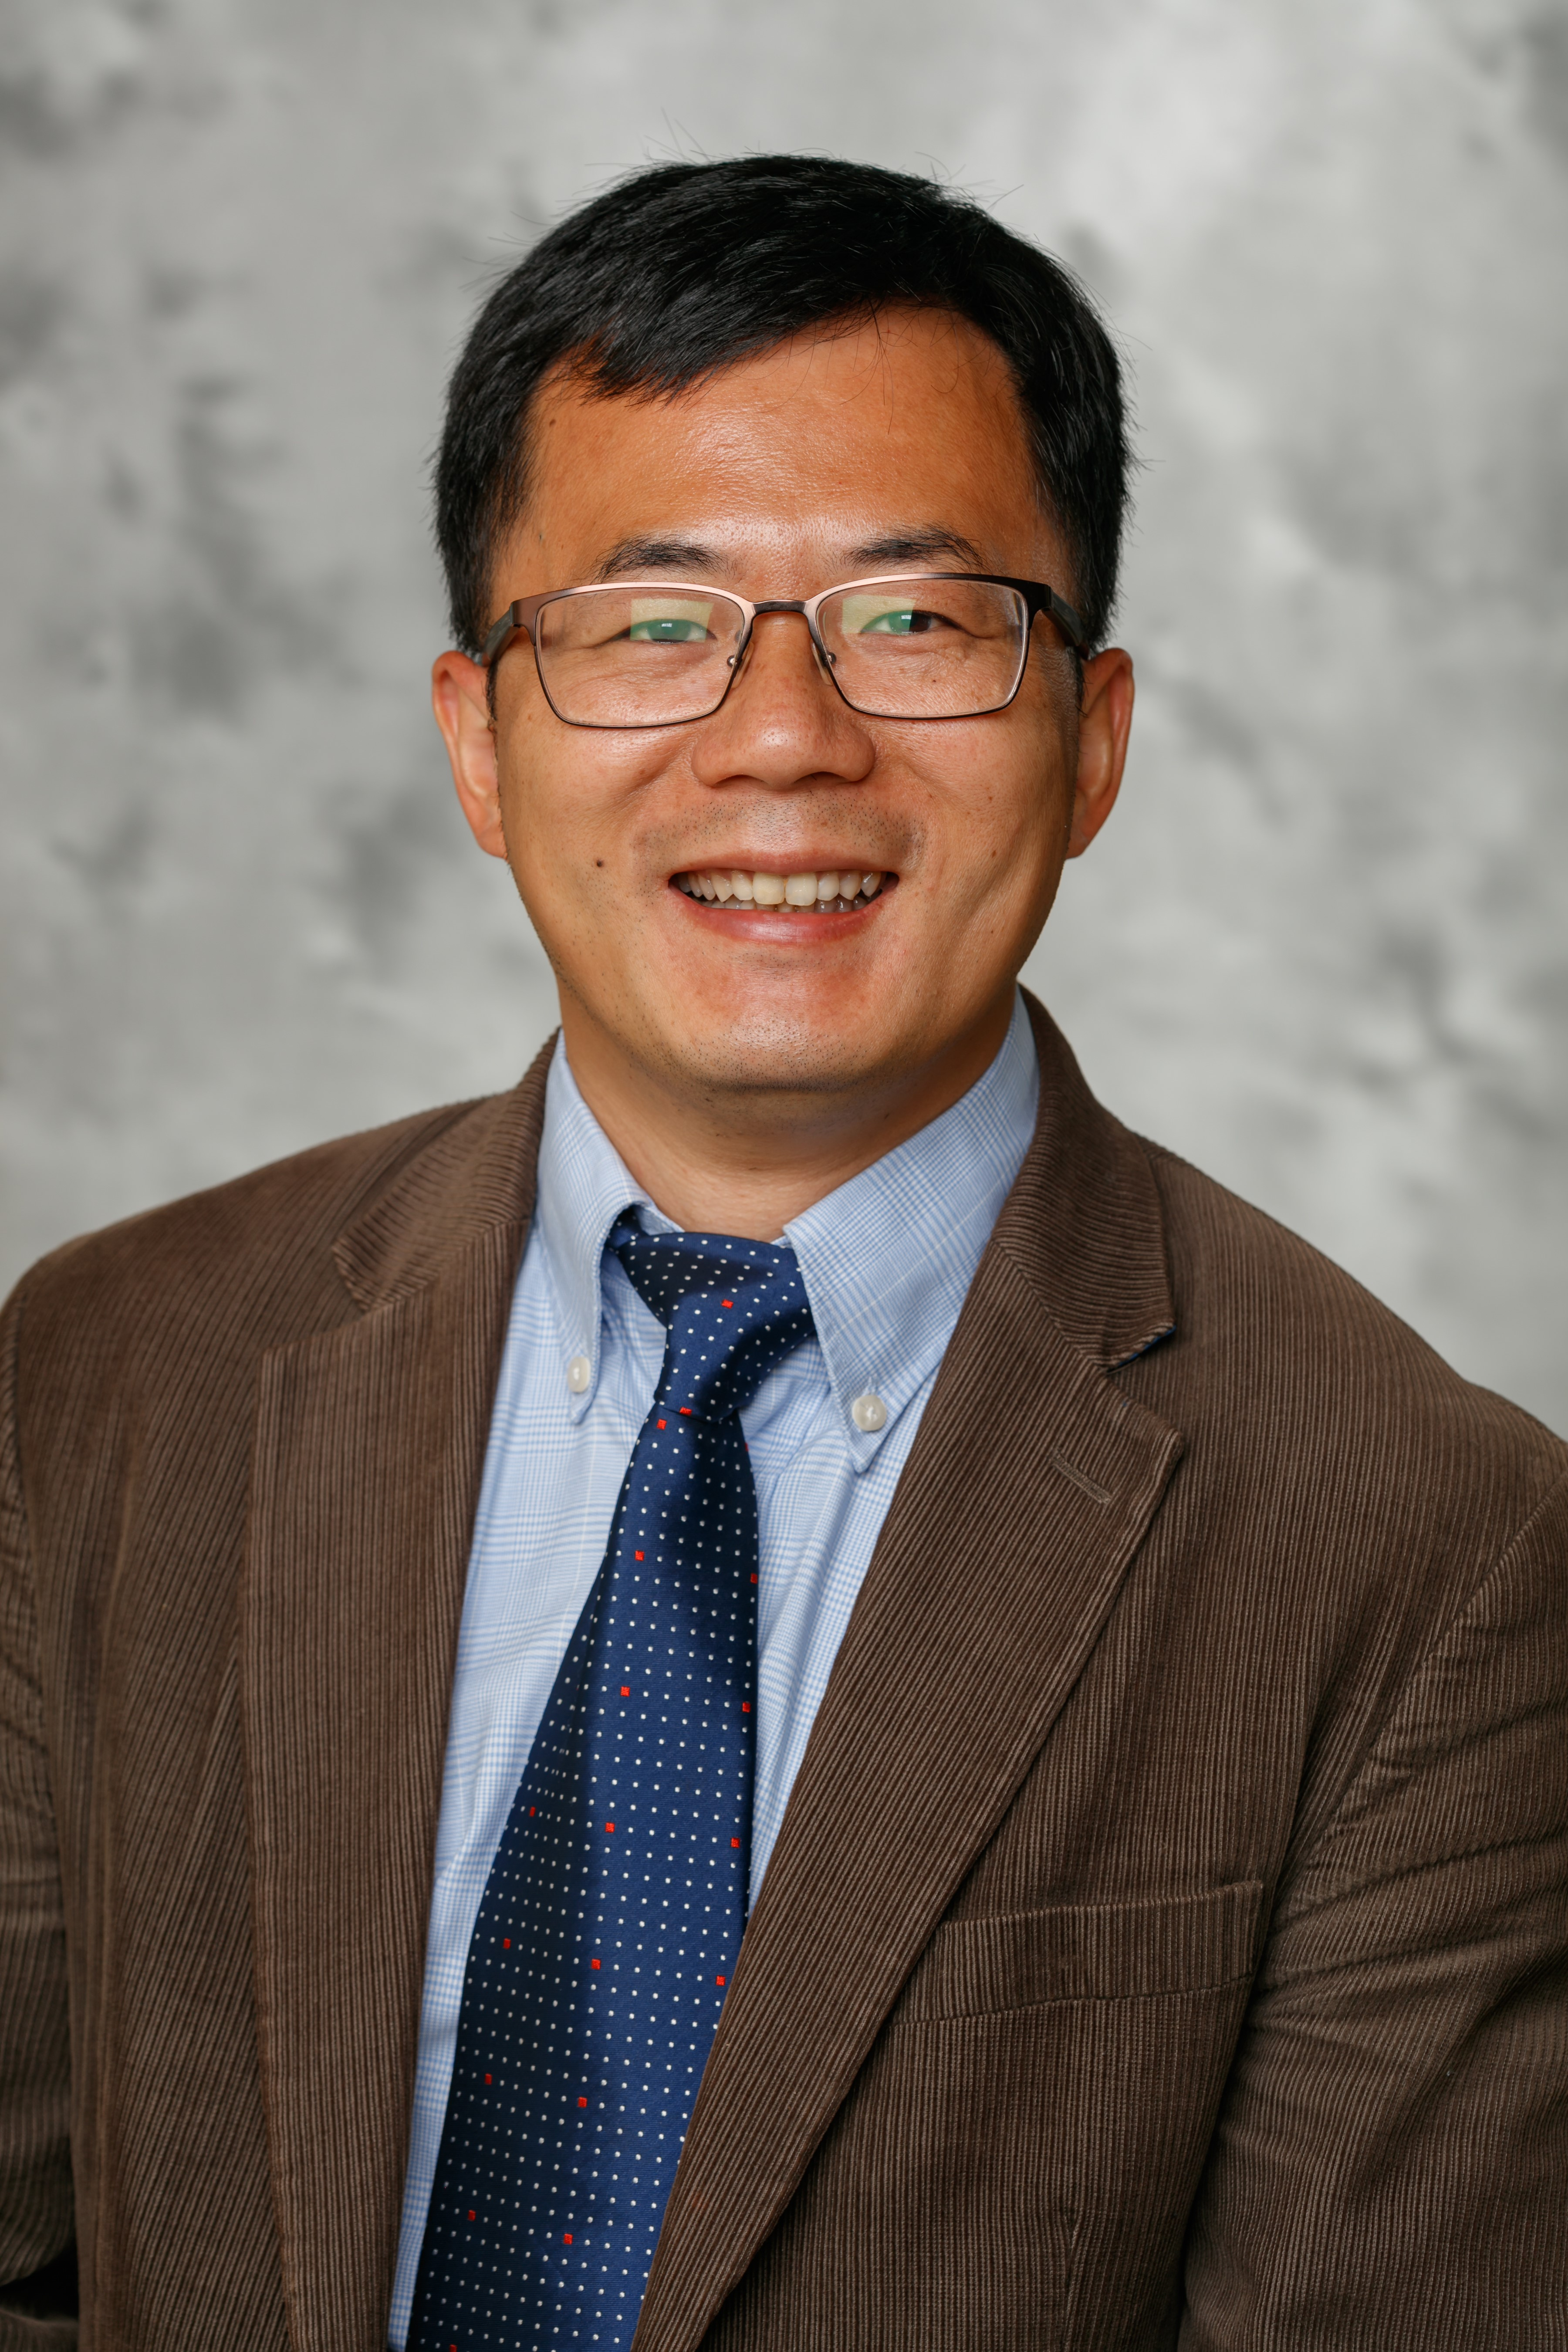 Prof. Yiying Wu